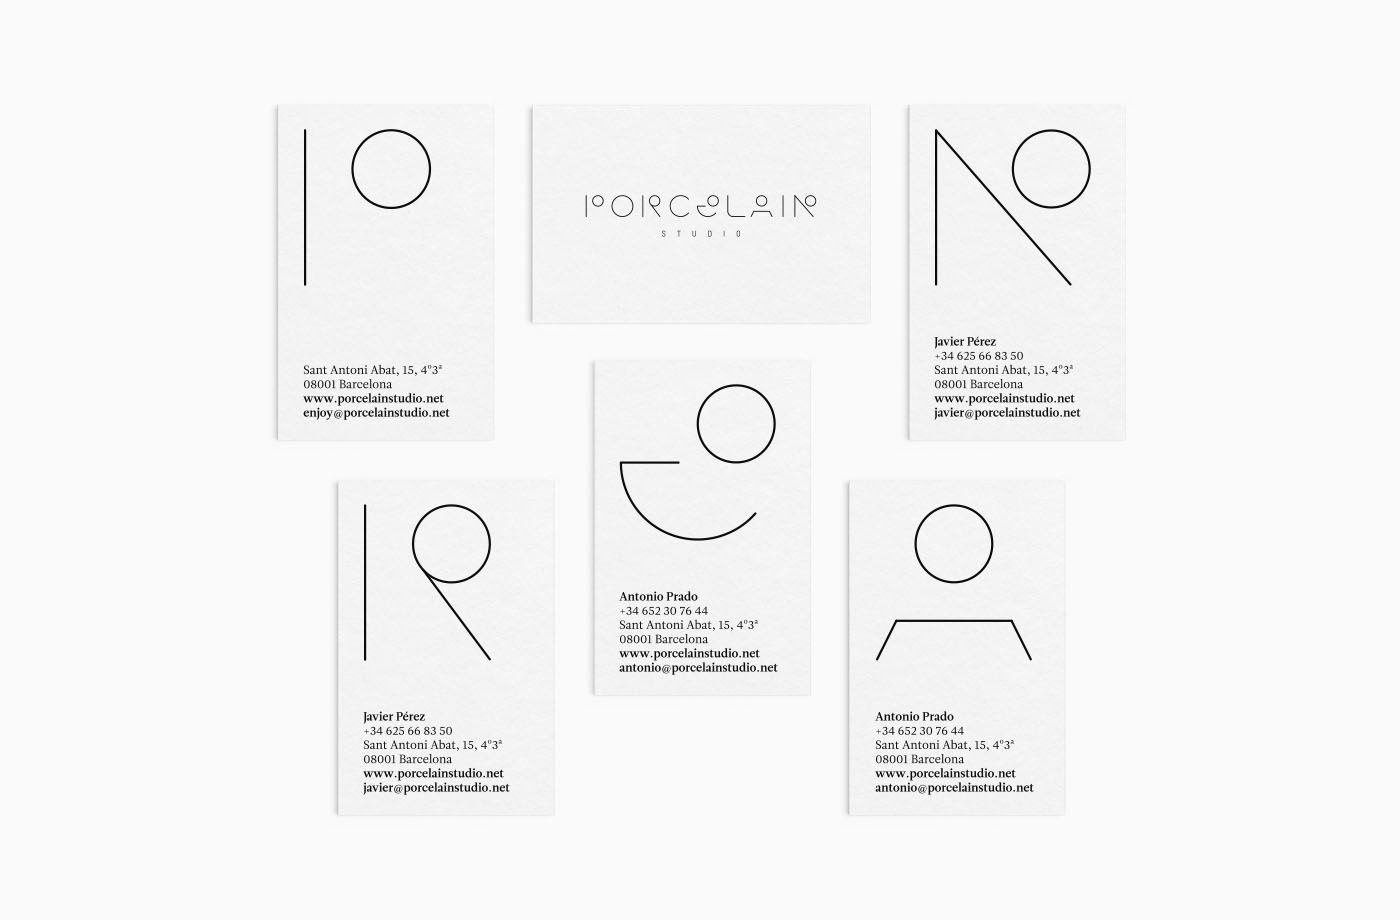 porcelain-studio-tarjetas-02